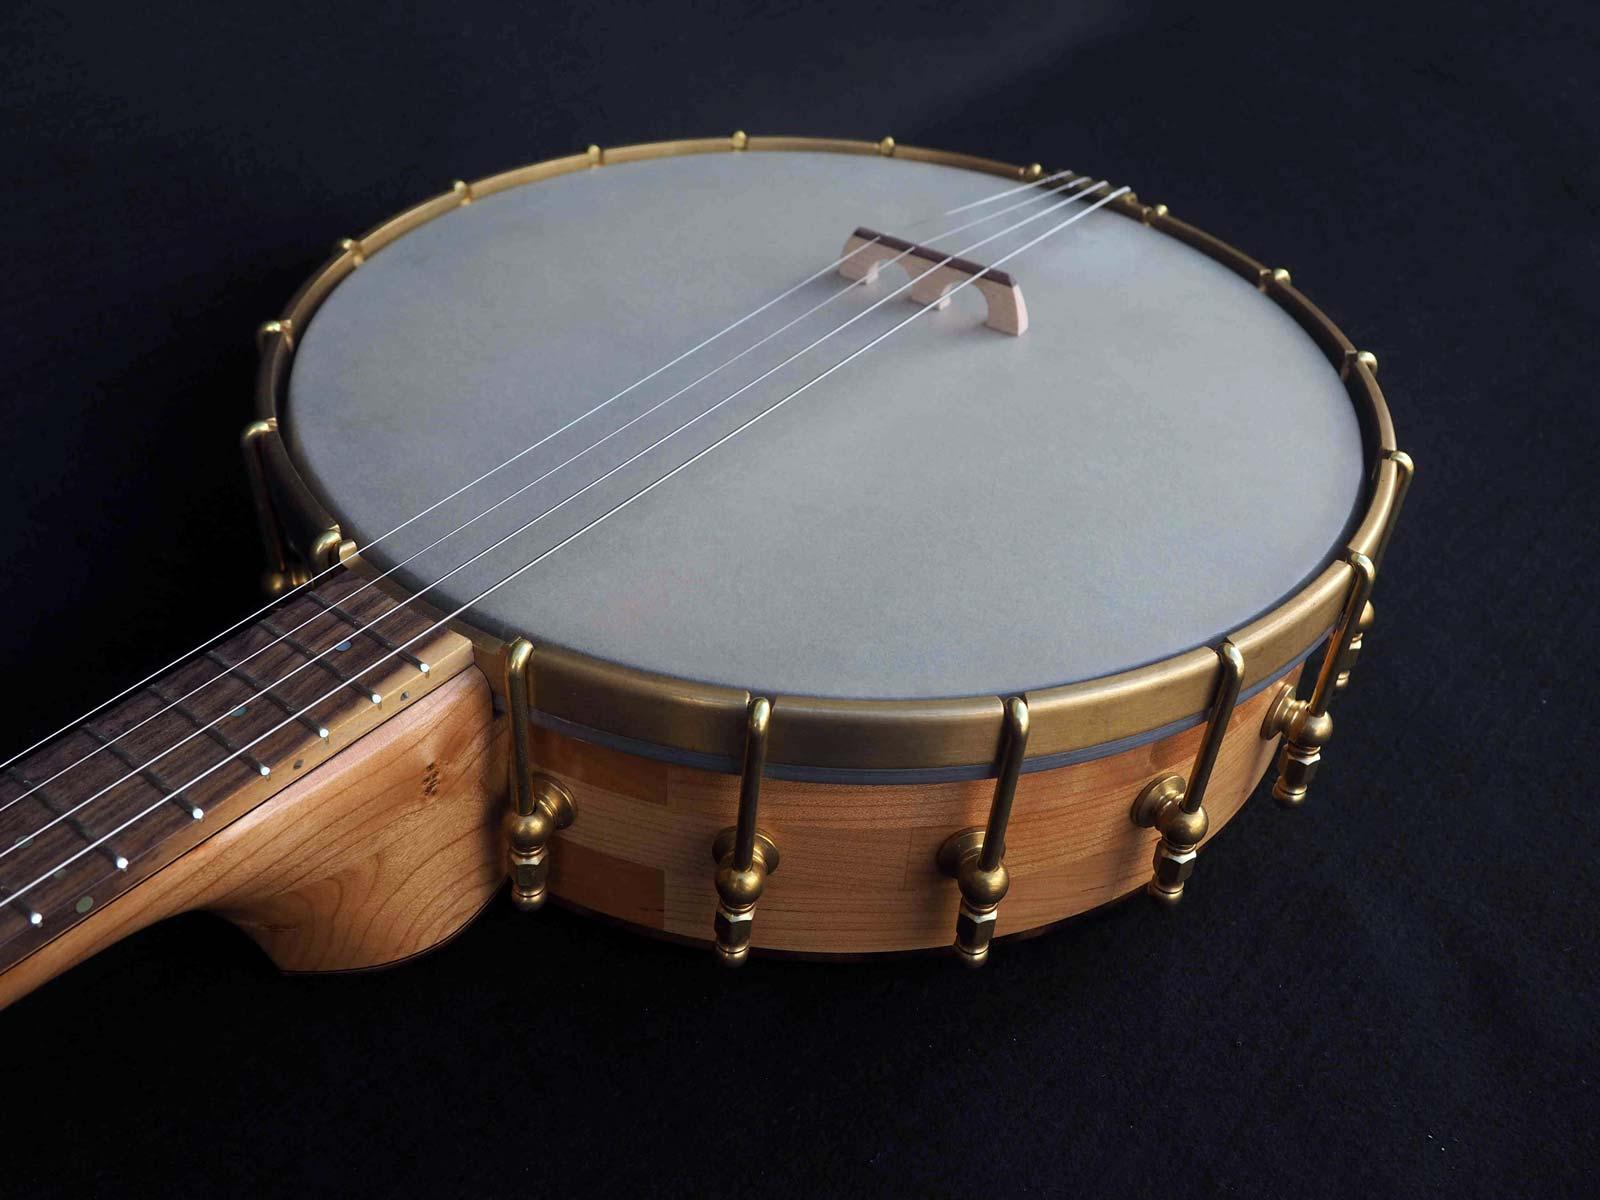 17 Fret Tenor banjo